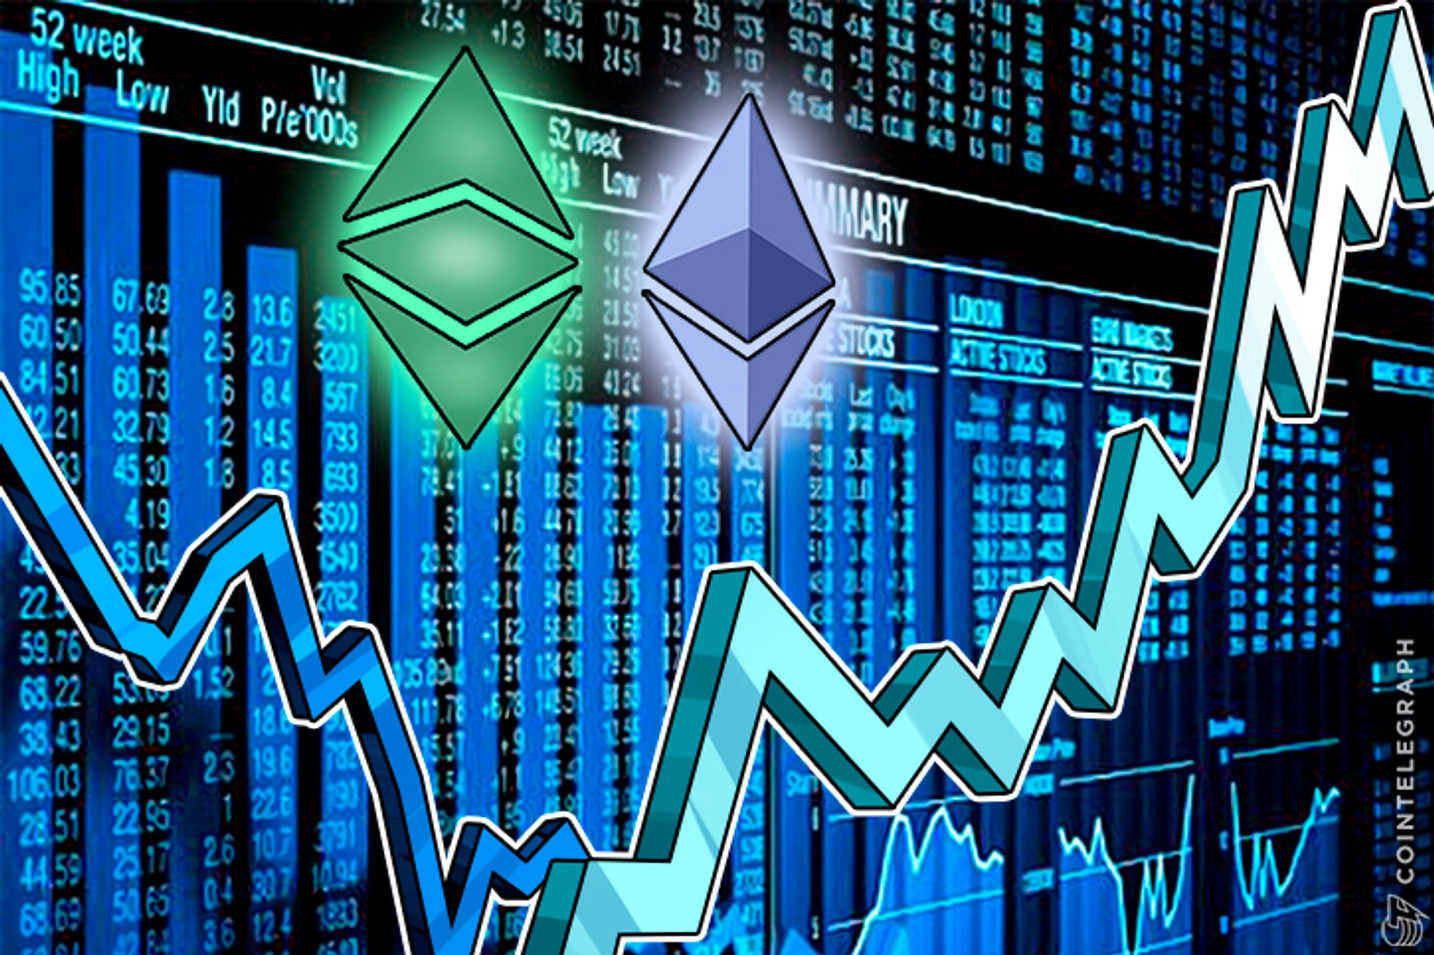 Ethereum Price Analysis: May 10 - 16